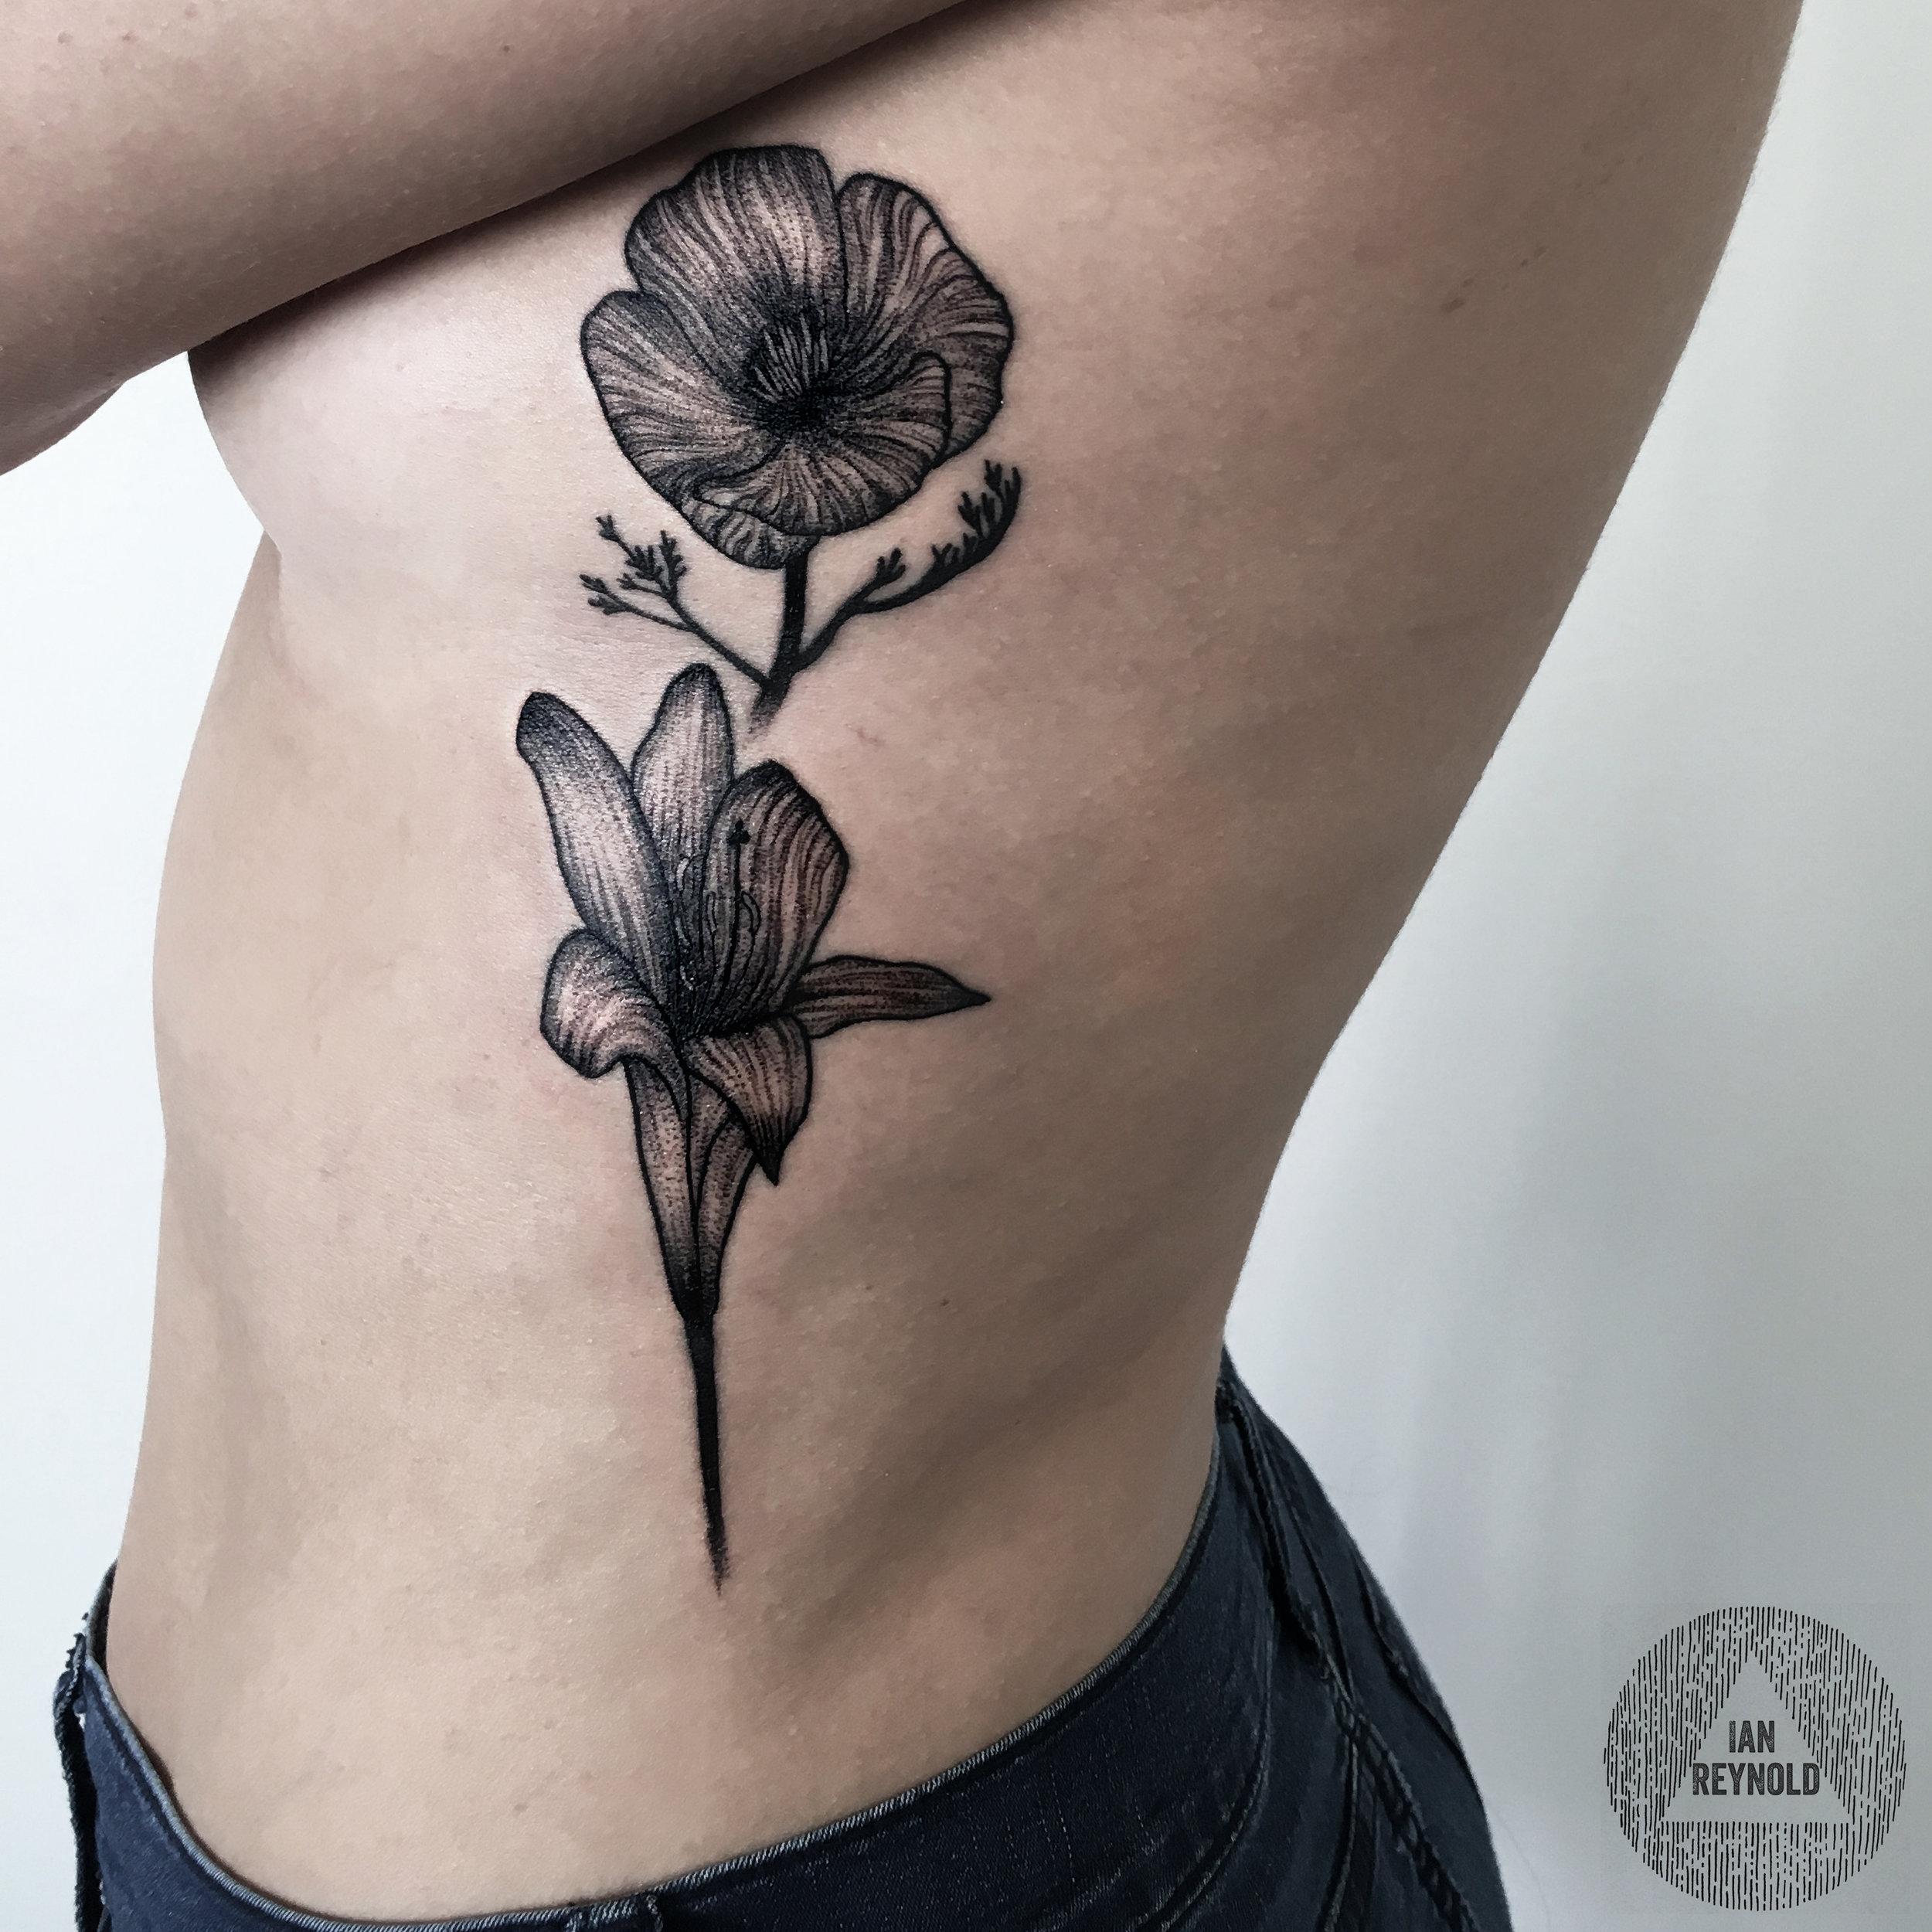 naked lady + California poppy